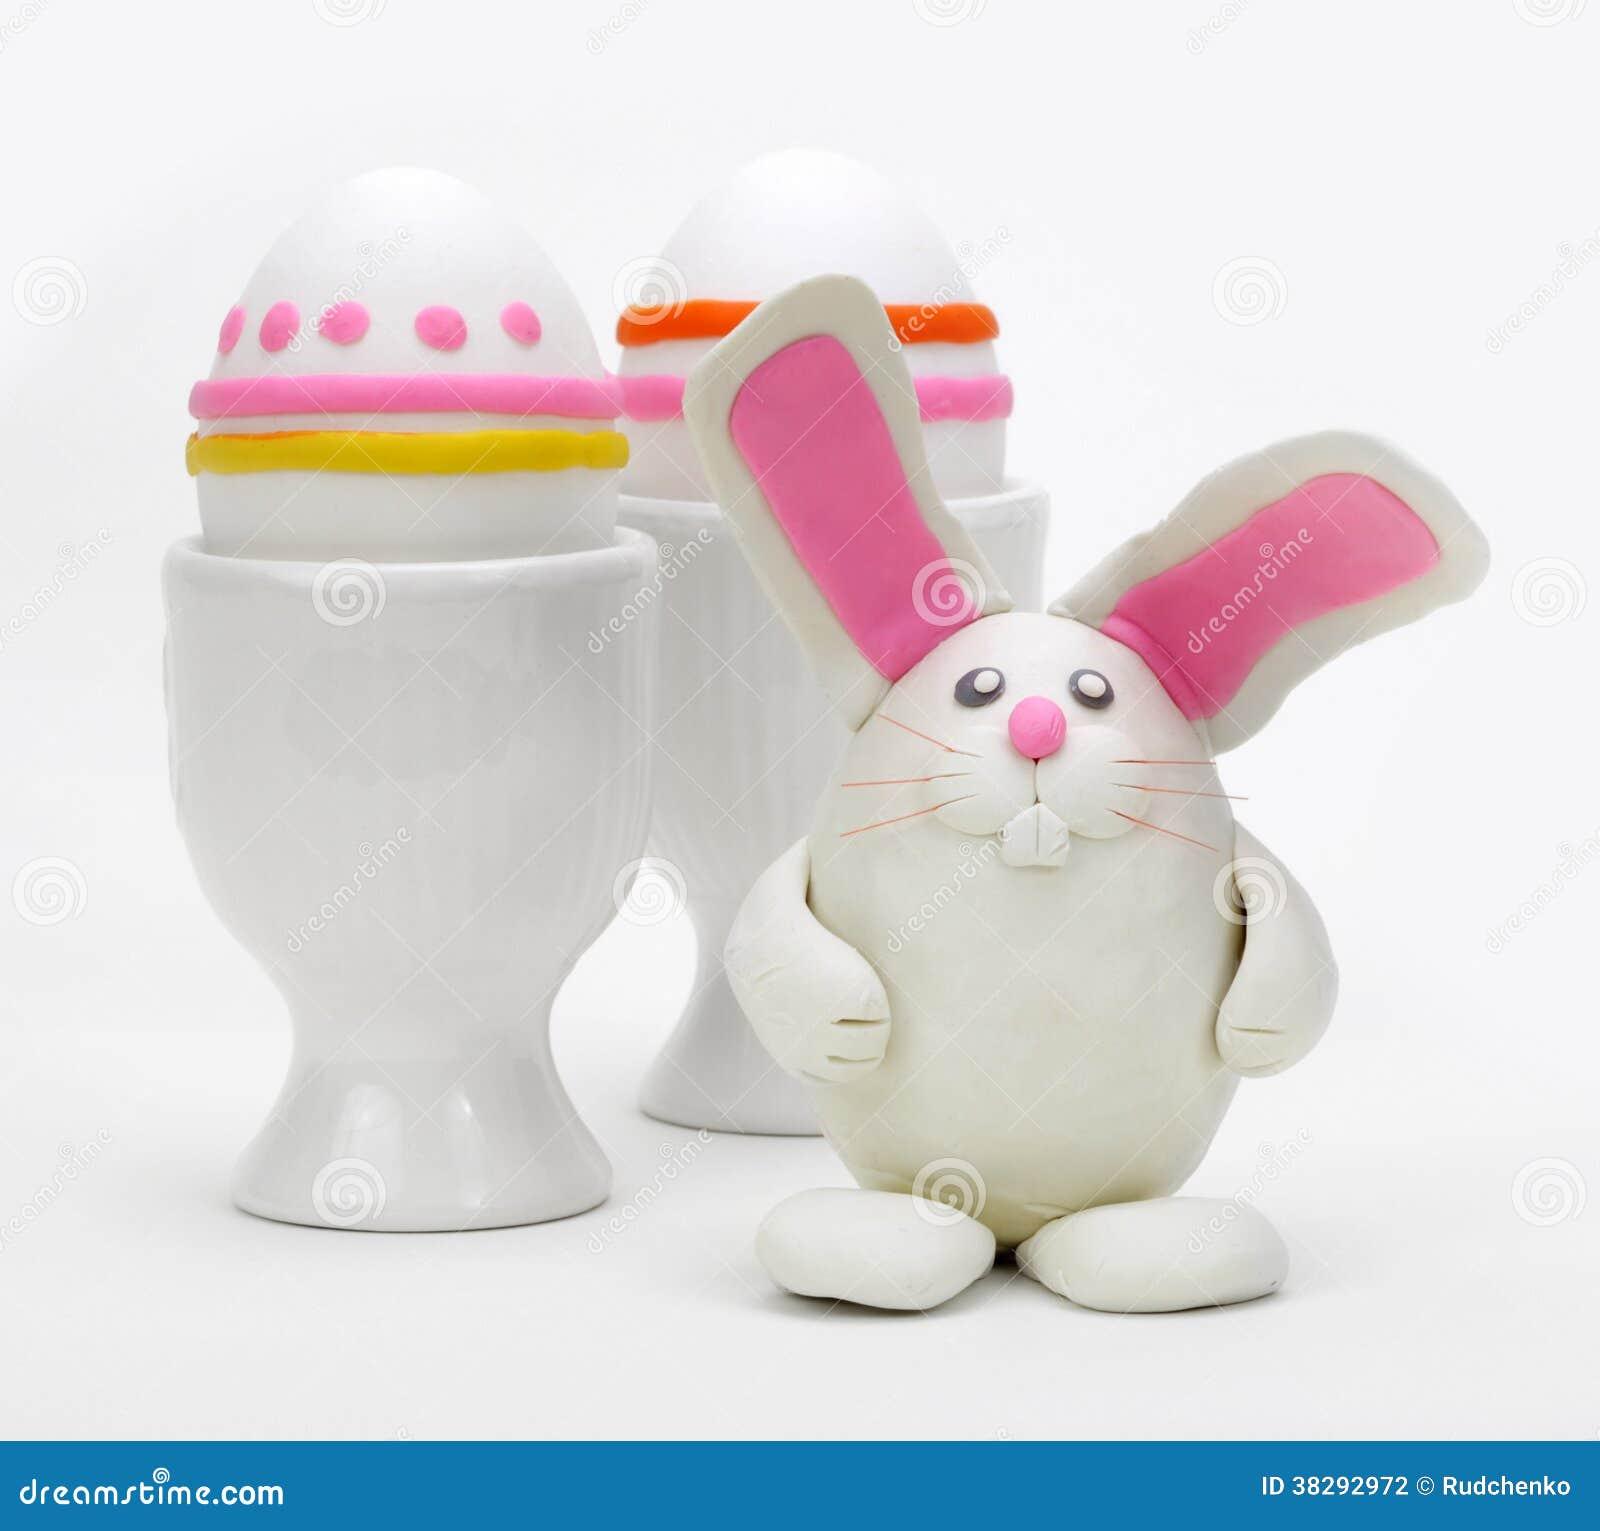 Plasticine bunny - different options 94